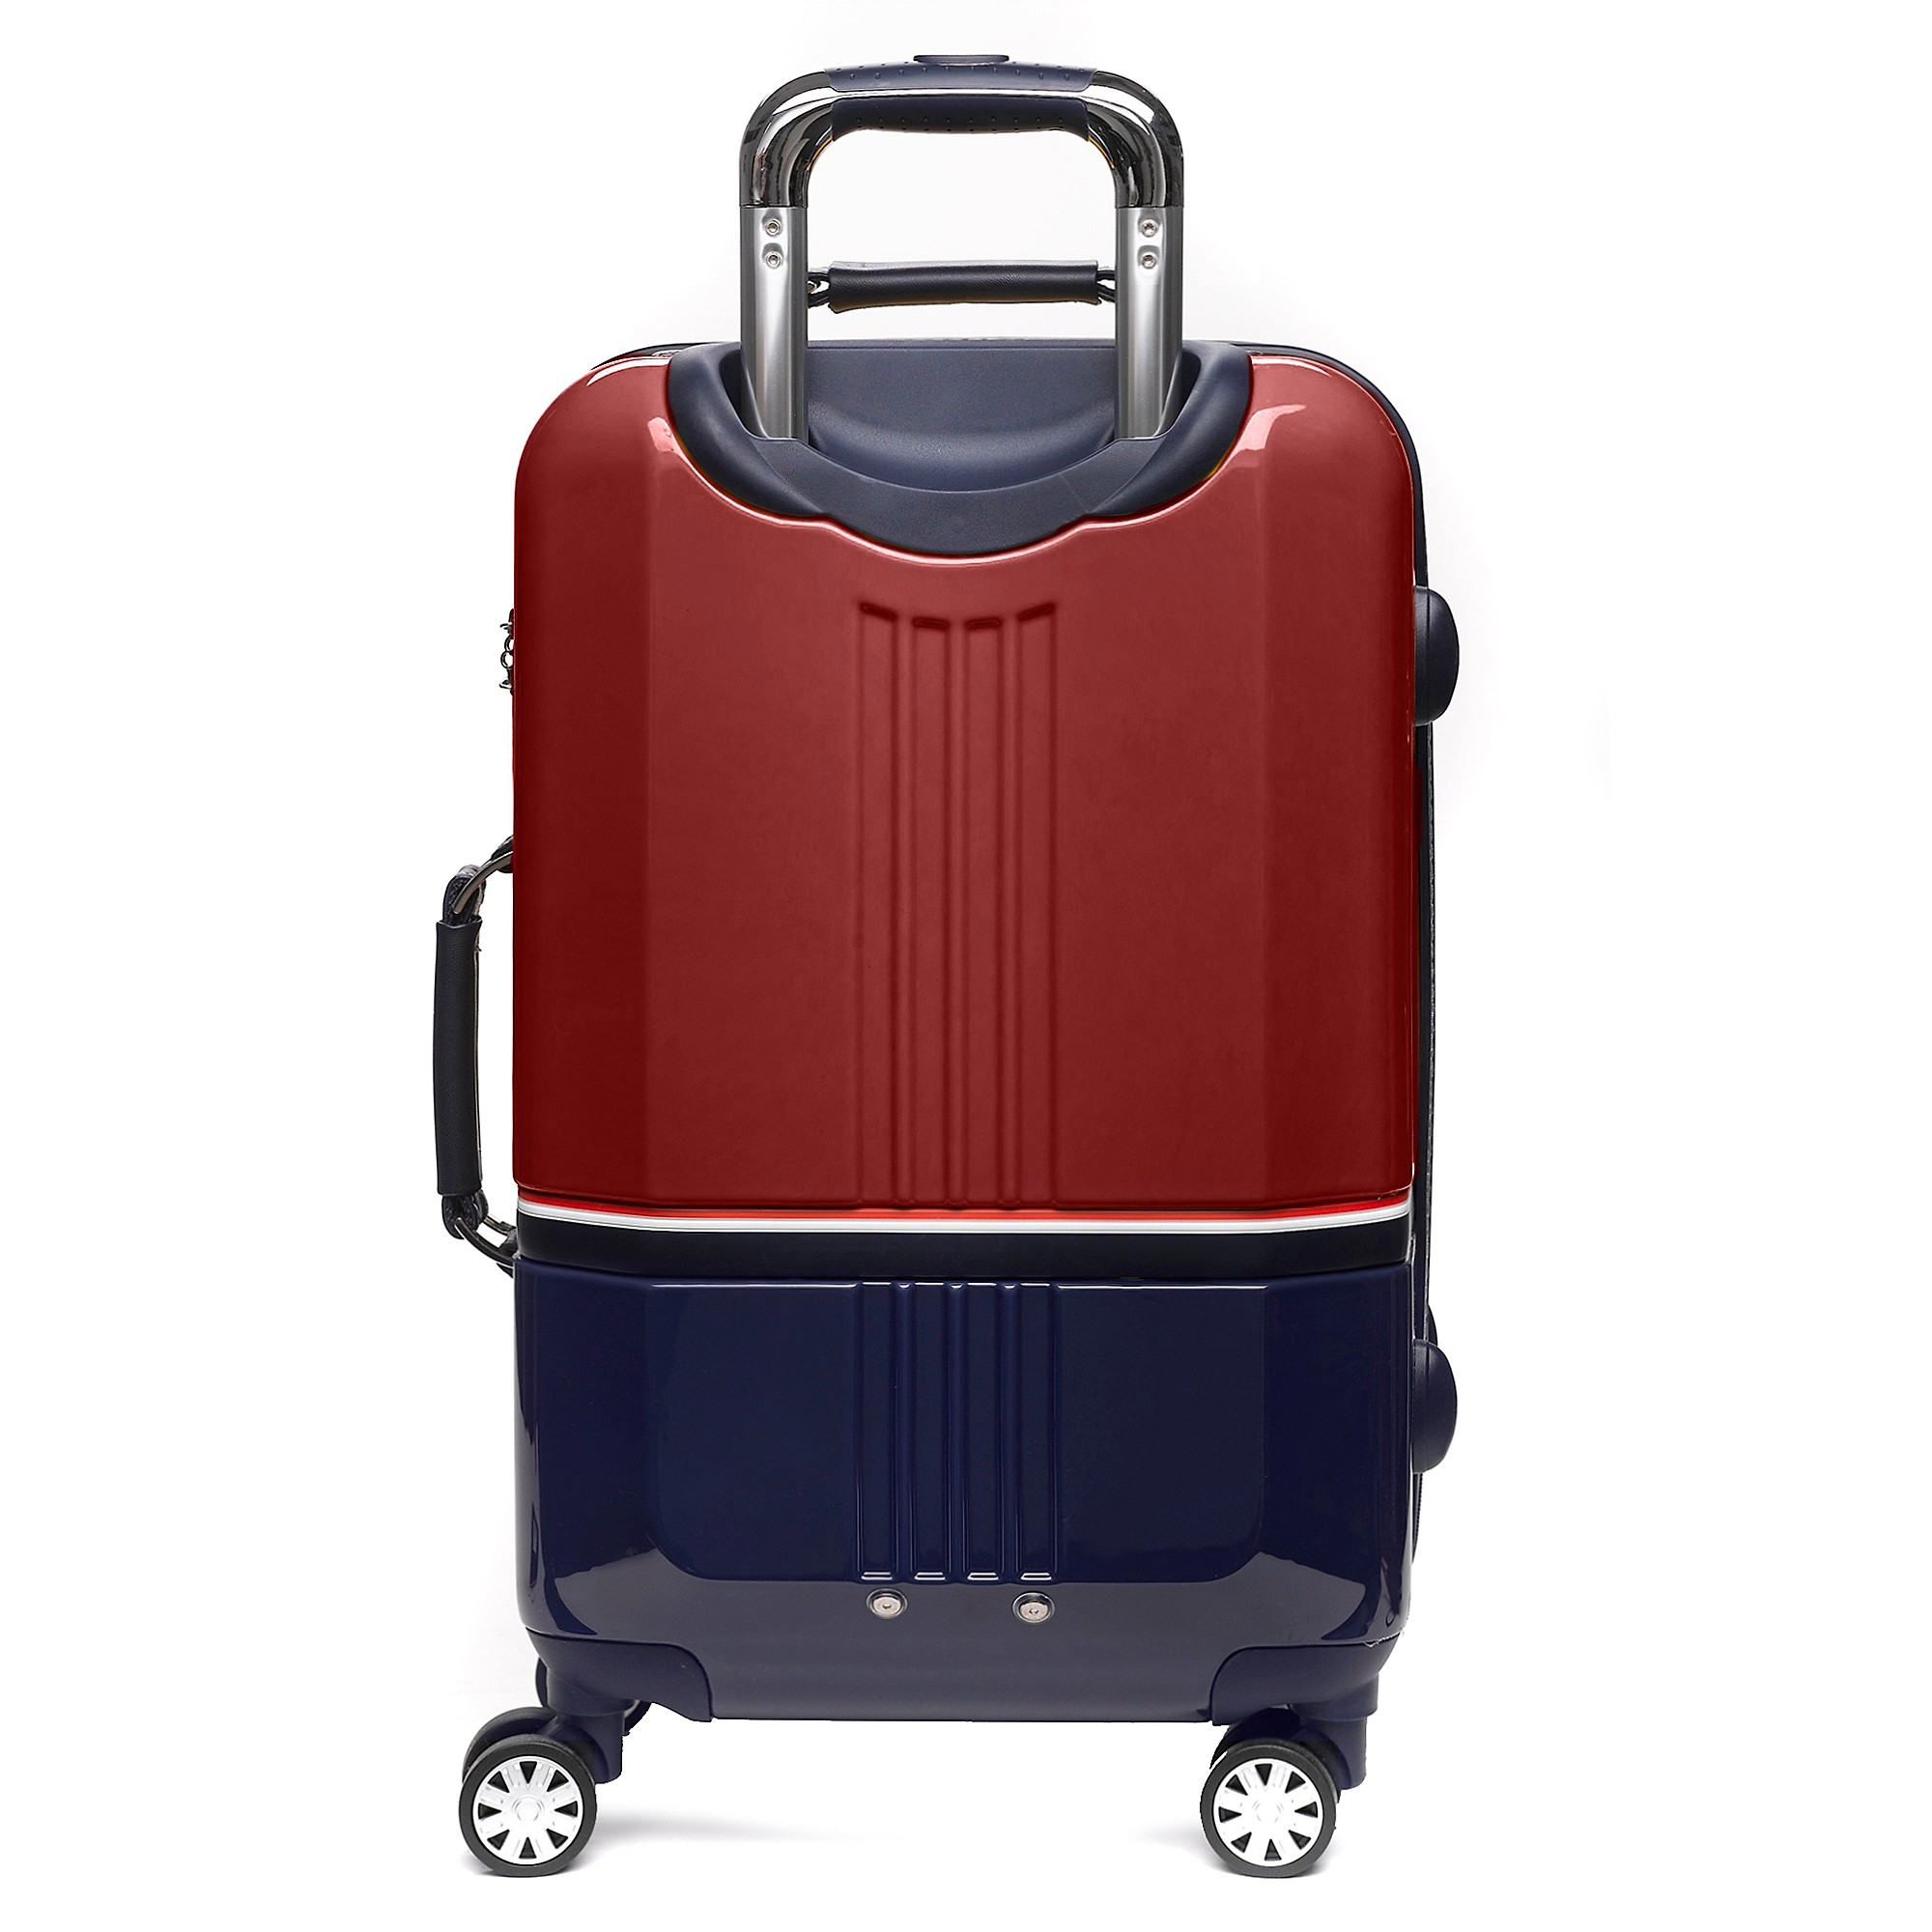 givenchy duo bag backpack - Ecosia 4691f422484e2